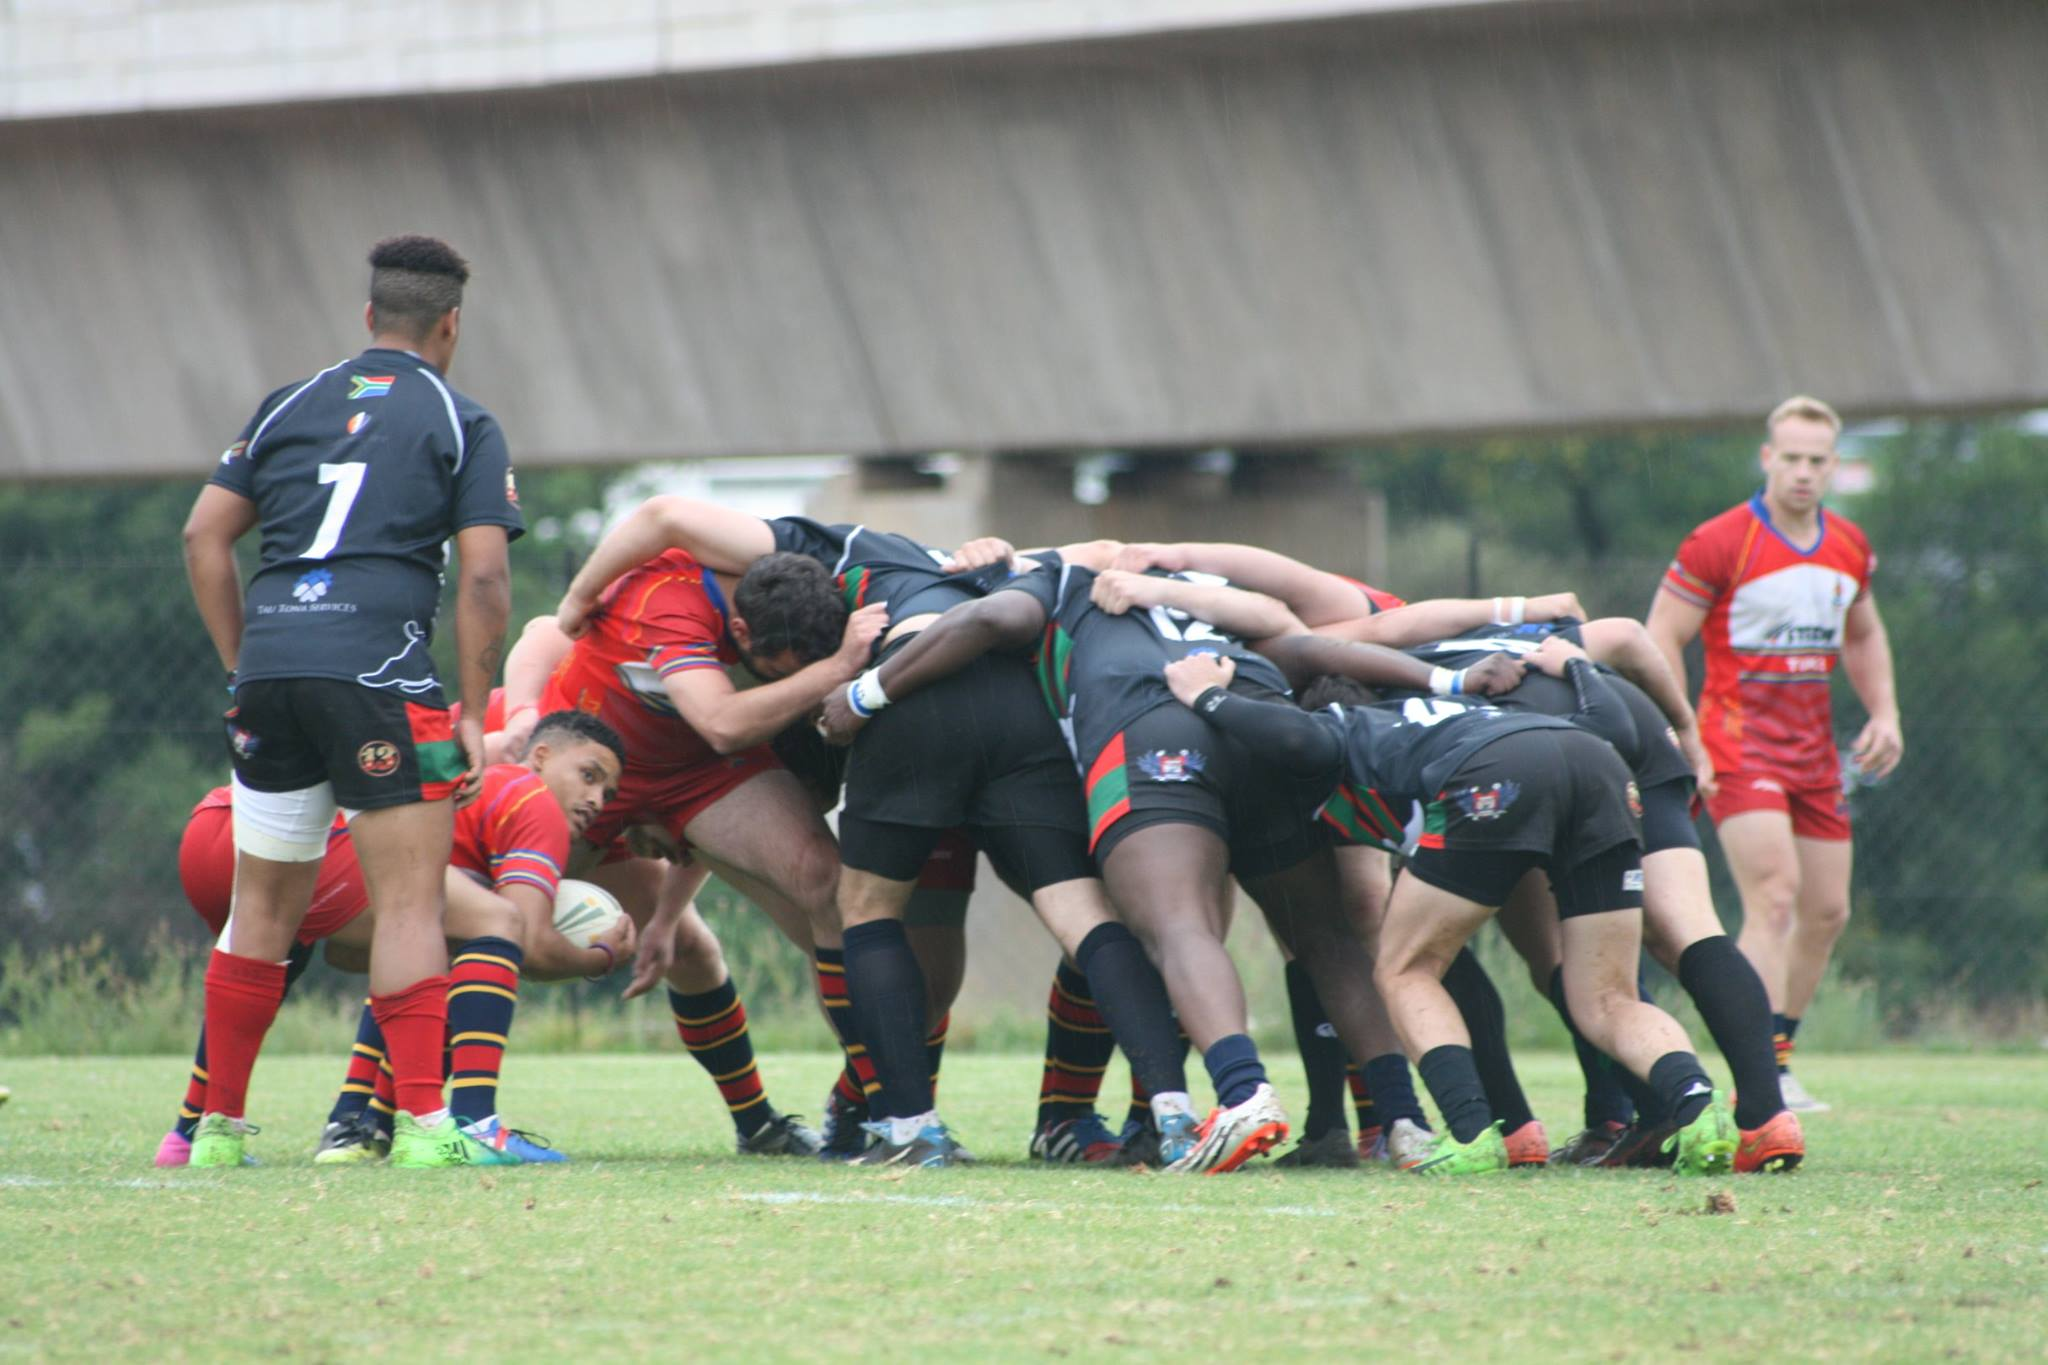 South African Rhino Cup kicks off in Silverton